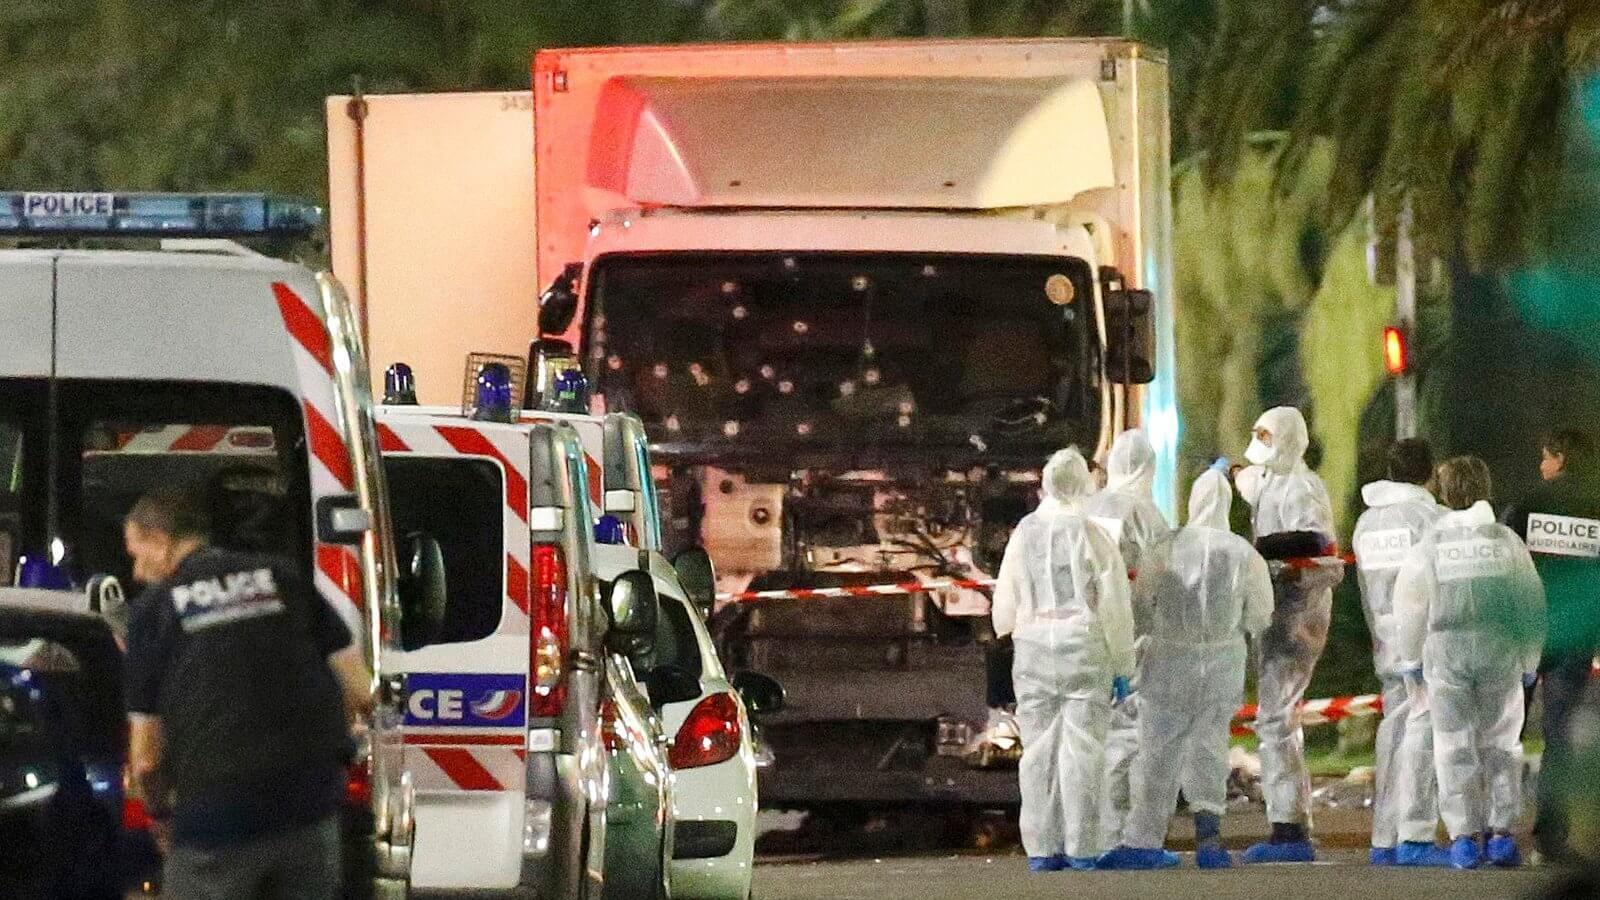 Теракт в Ницце Франция. Террорист на грузовике давил людей 14.07.2016